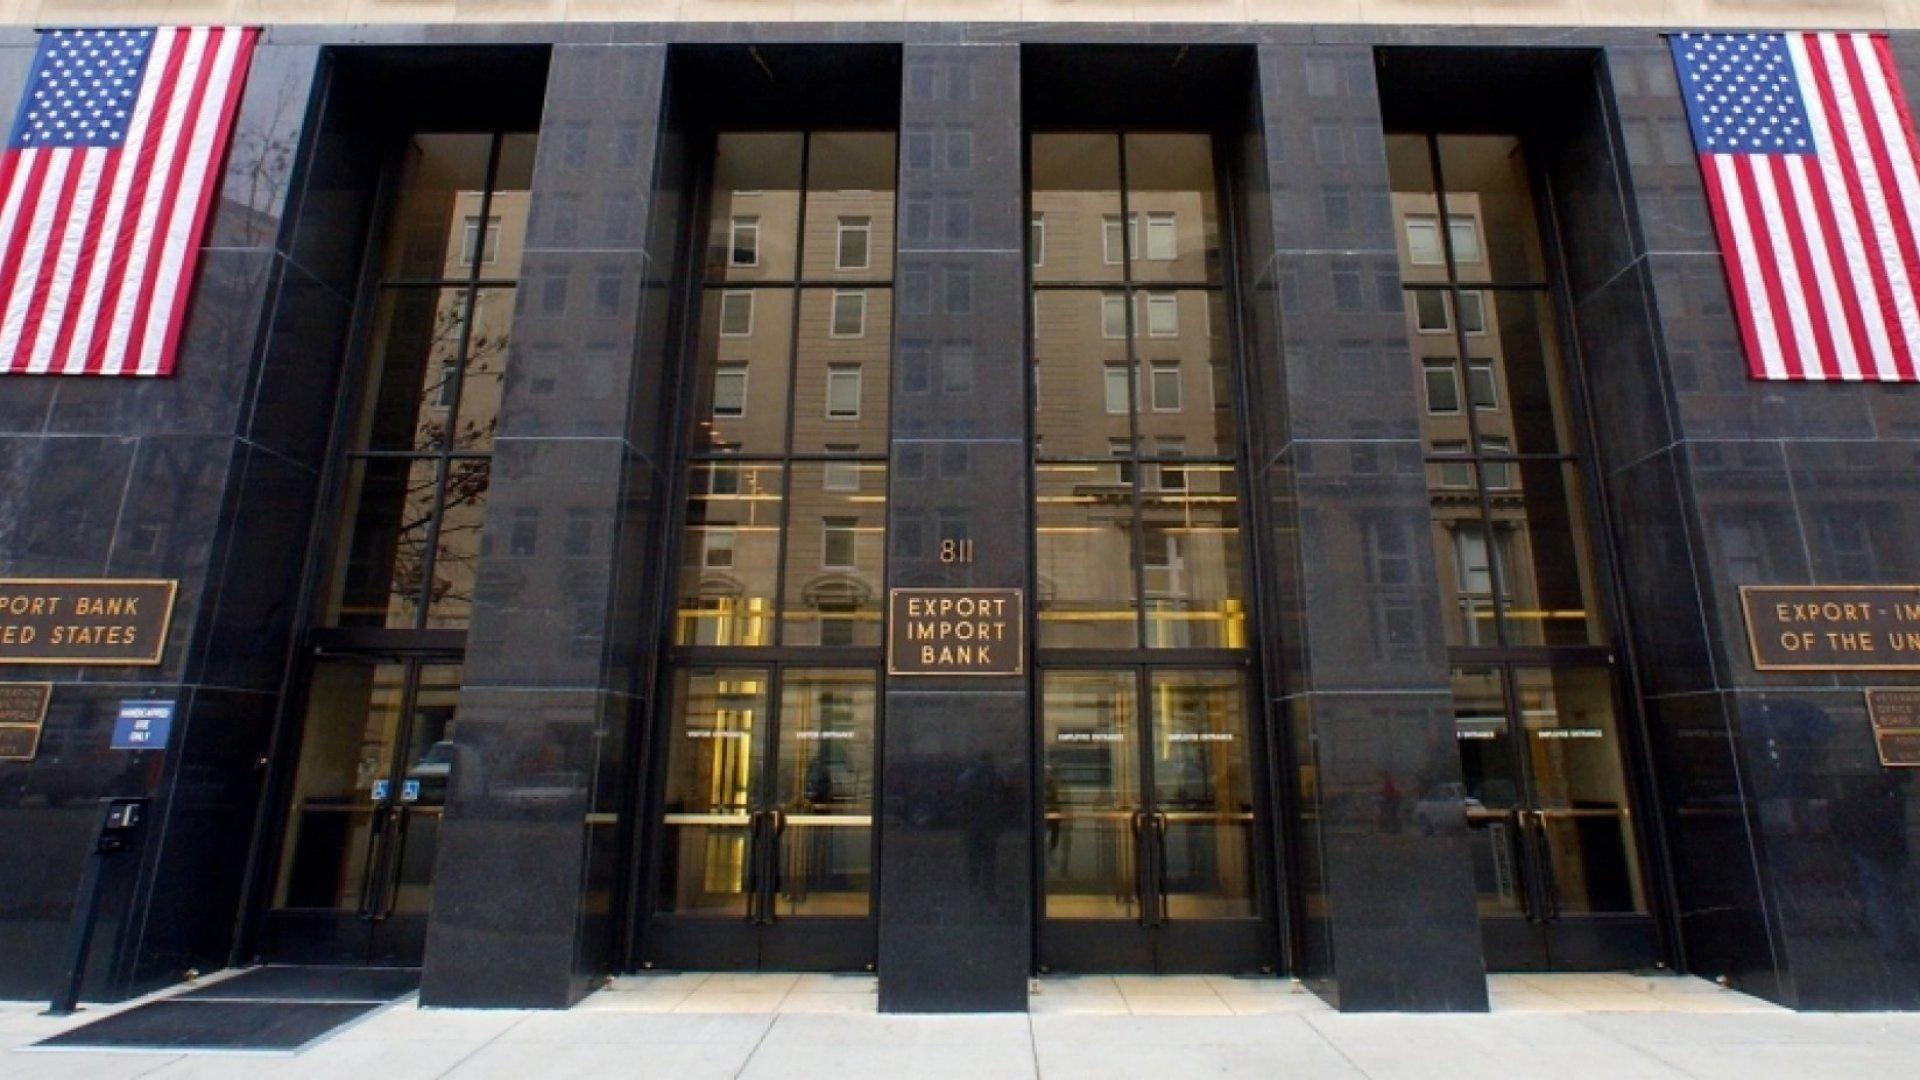 4 Reasons the Ex-Im Bank Passage Will Help the U.S. Economy